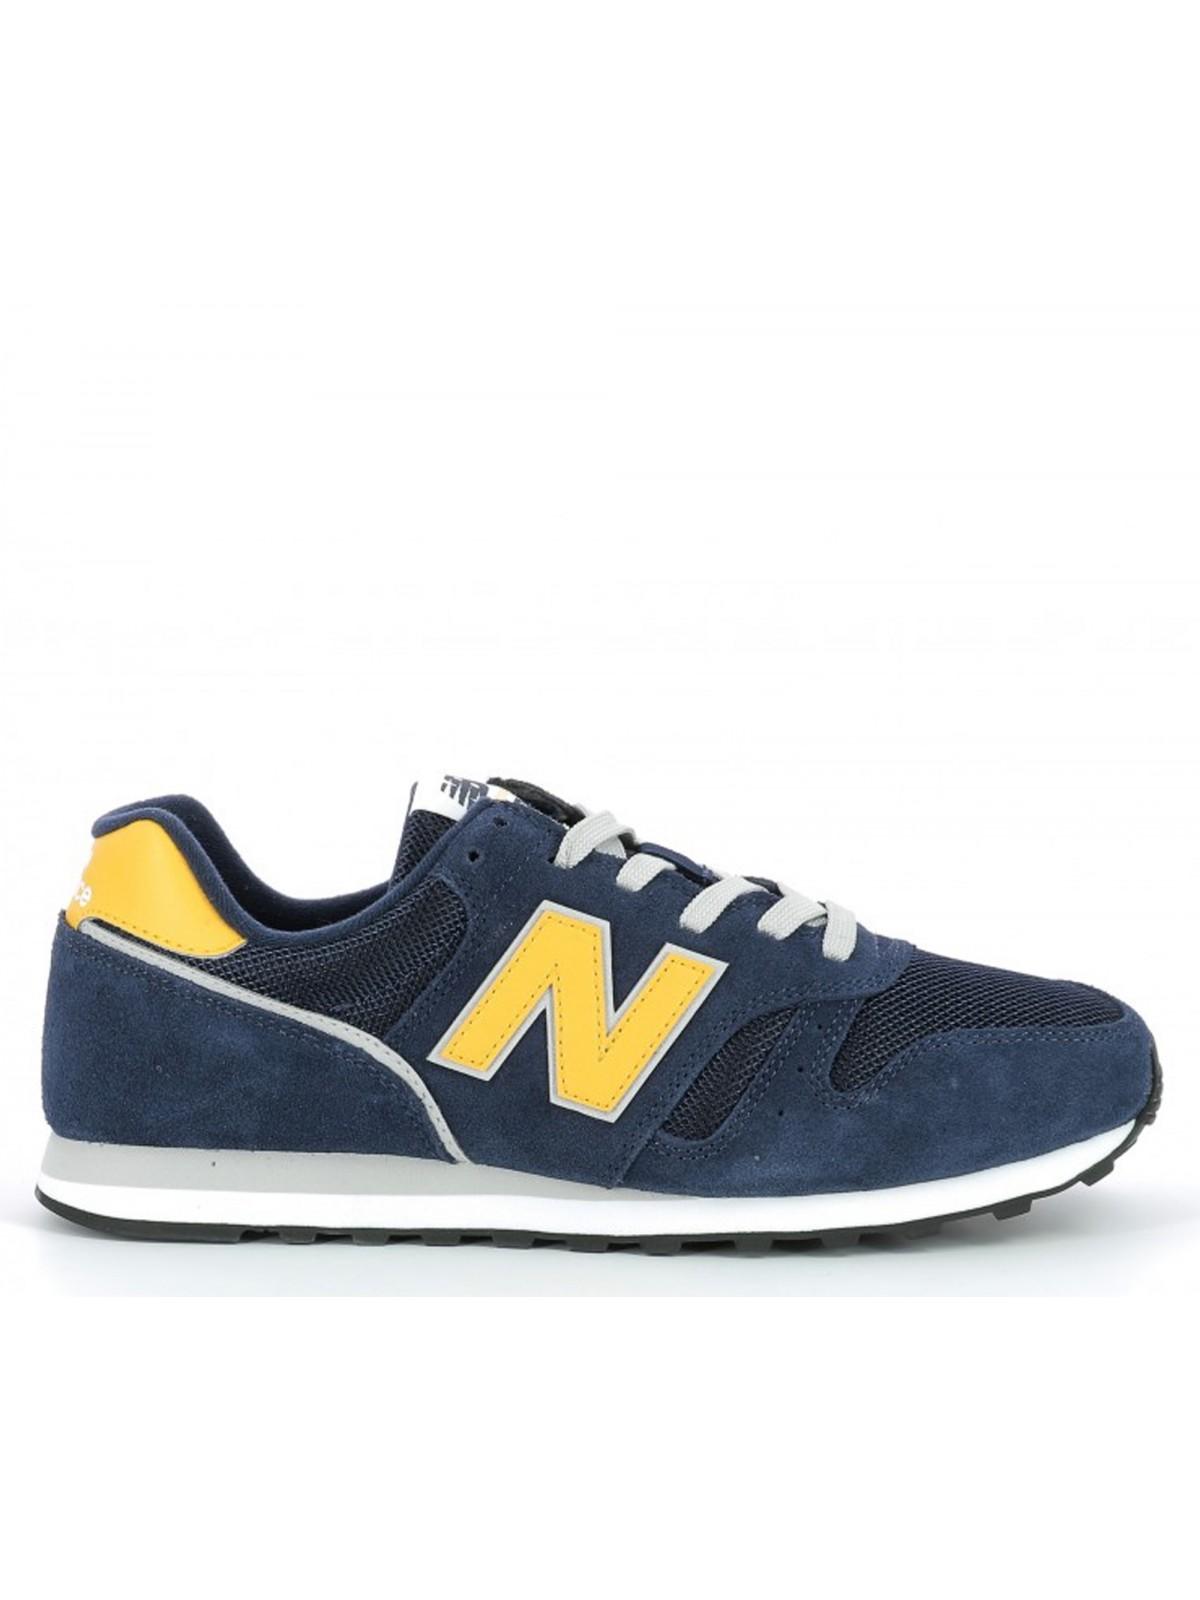 new balance ml373 navy